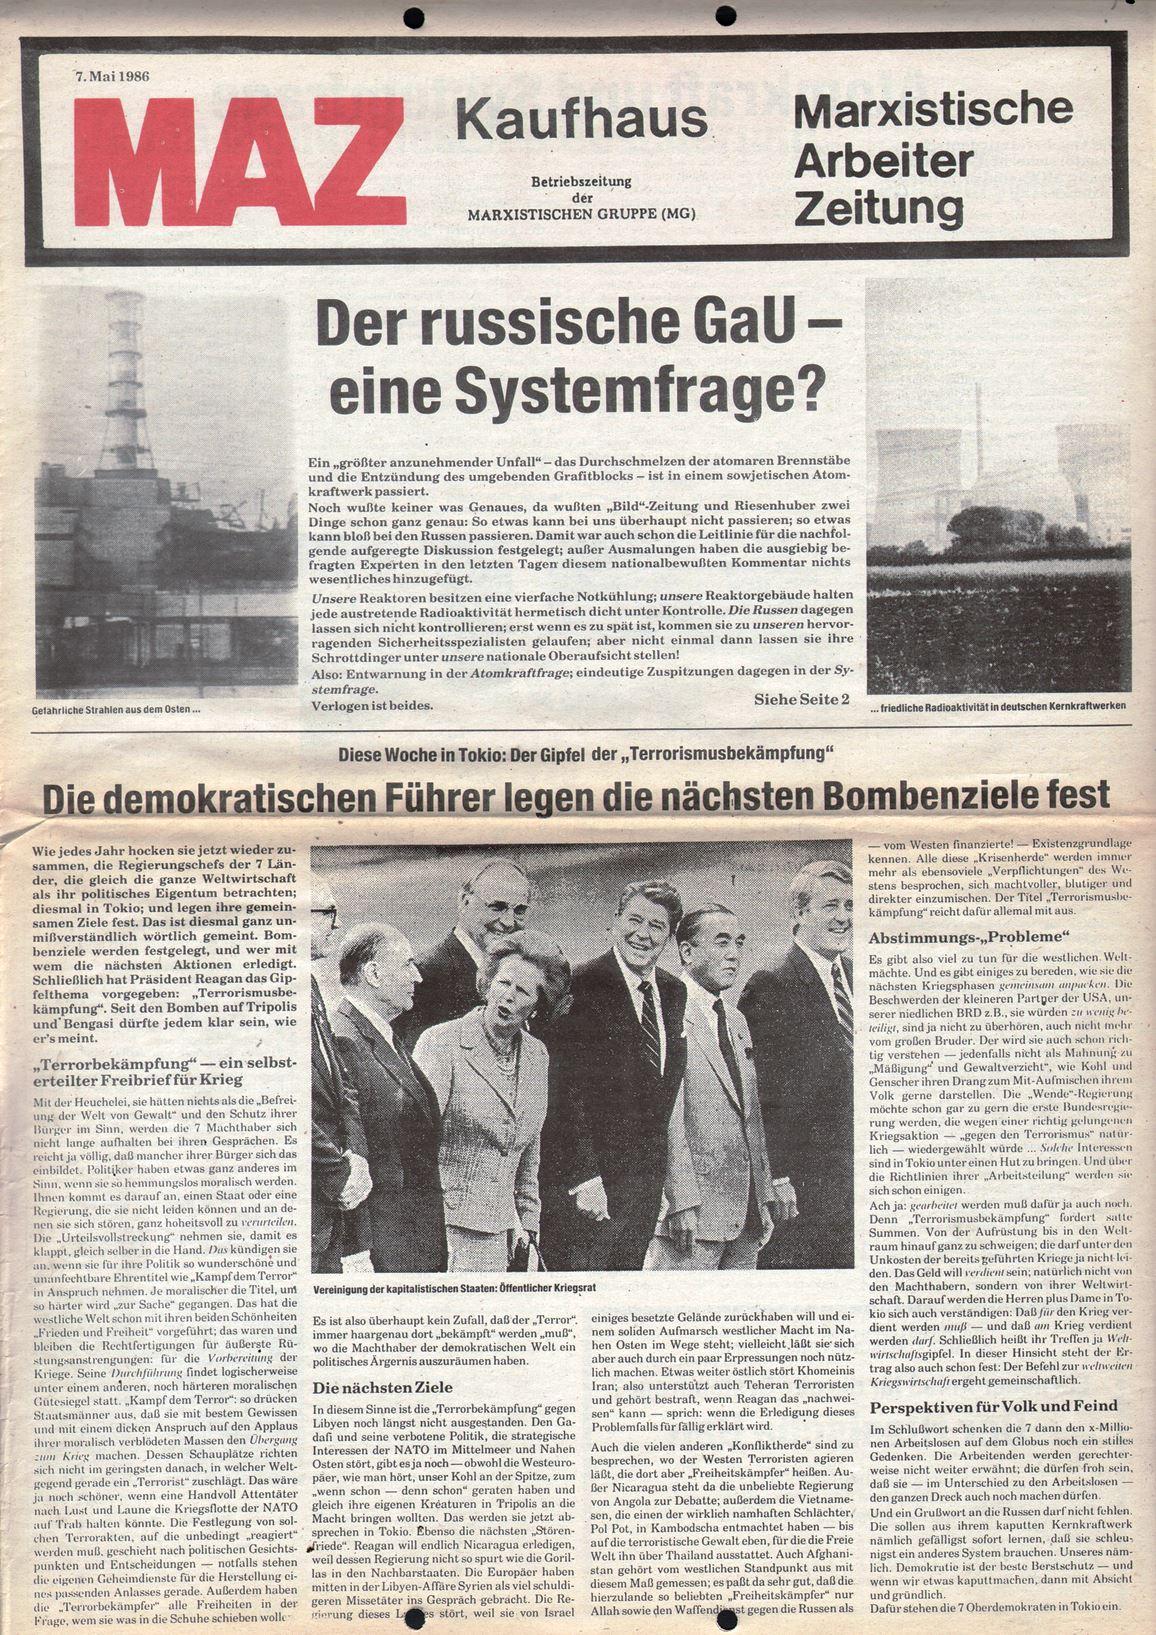 Muenchen_MG_MAZ_Kaufhaus_19860507_01